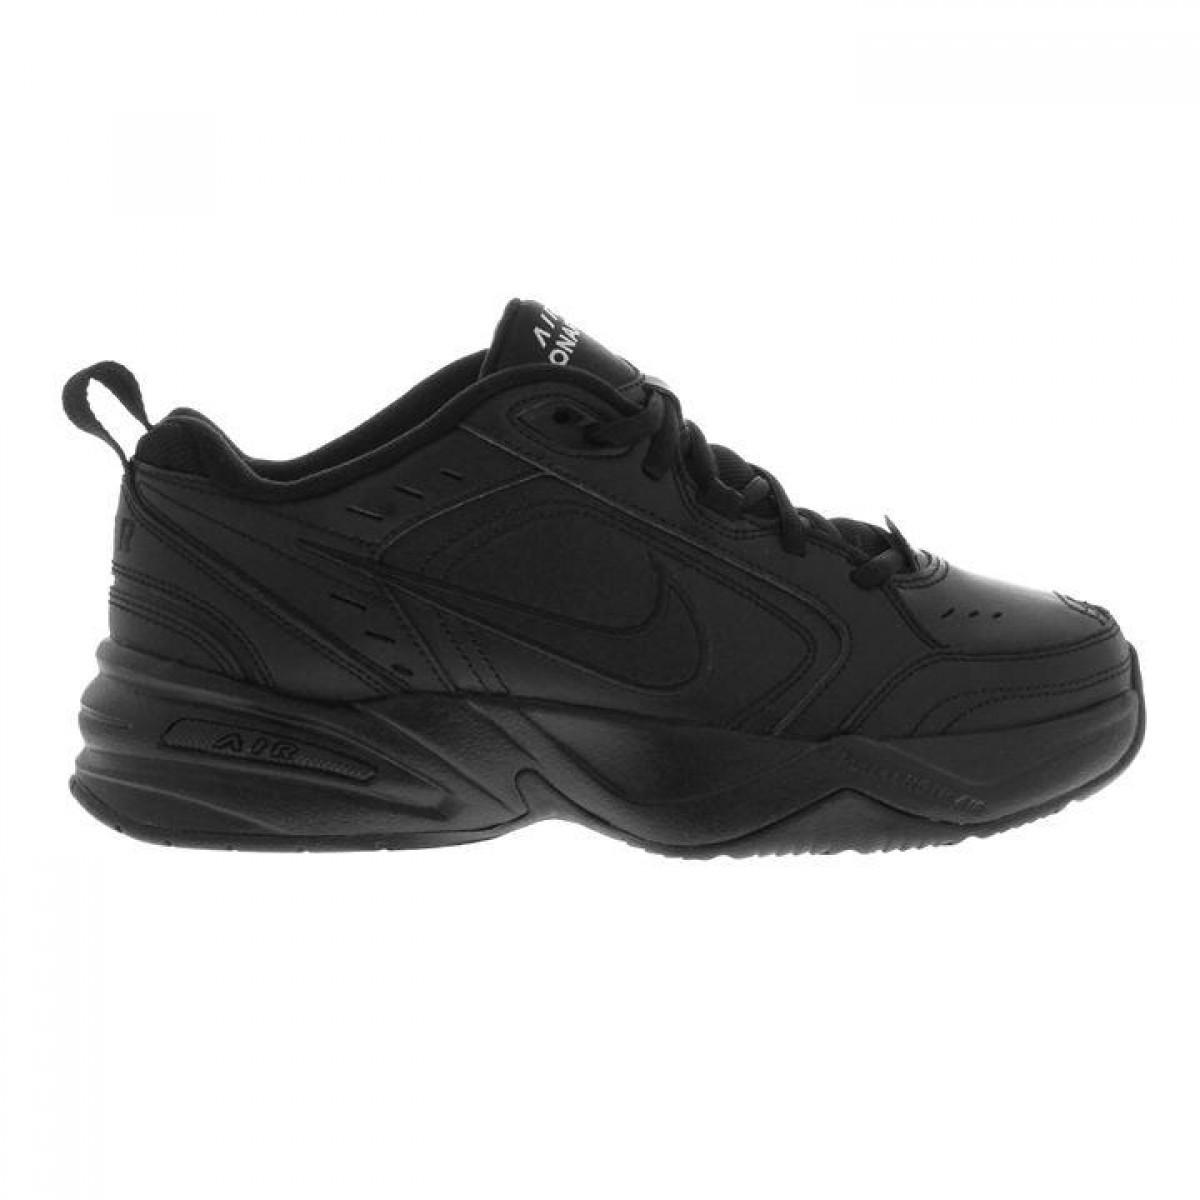 cdf2f8b63f43 Кроссовки Nike Air Monarch Trainers Black - Оригинал - FAIR - оригинальная  одежда и обувь в